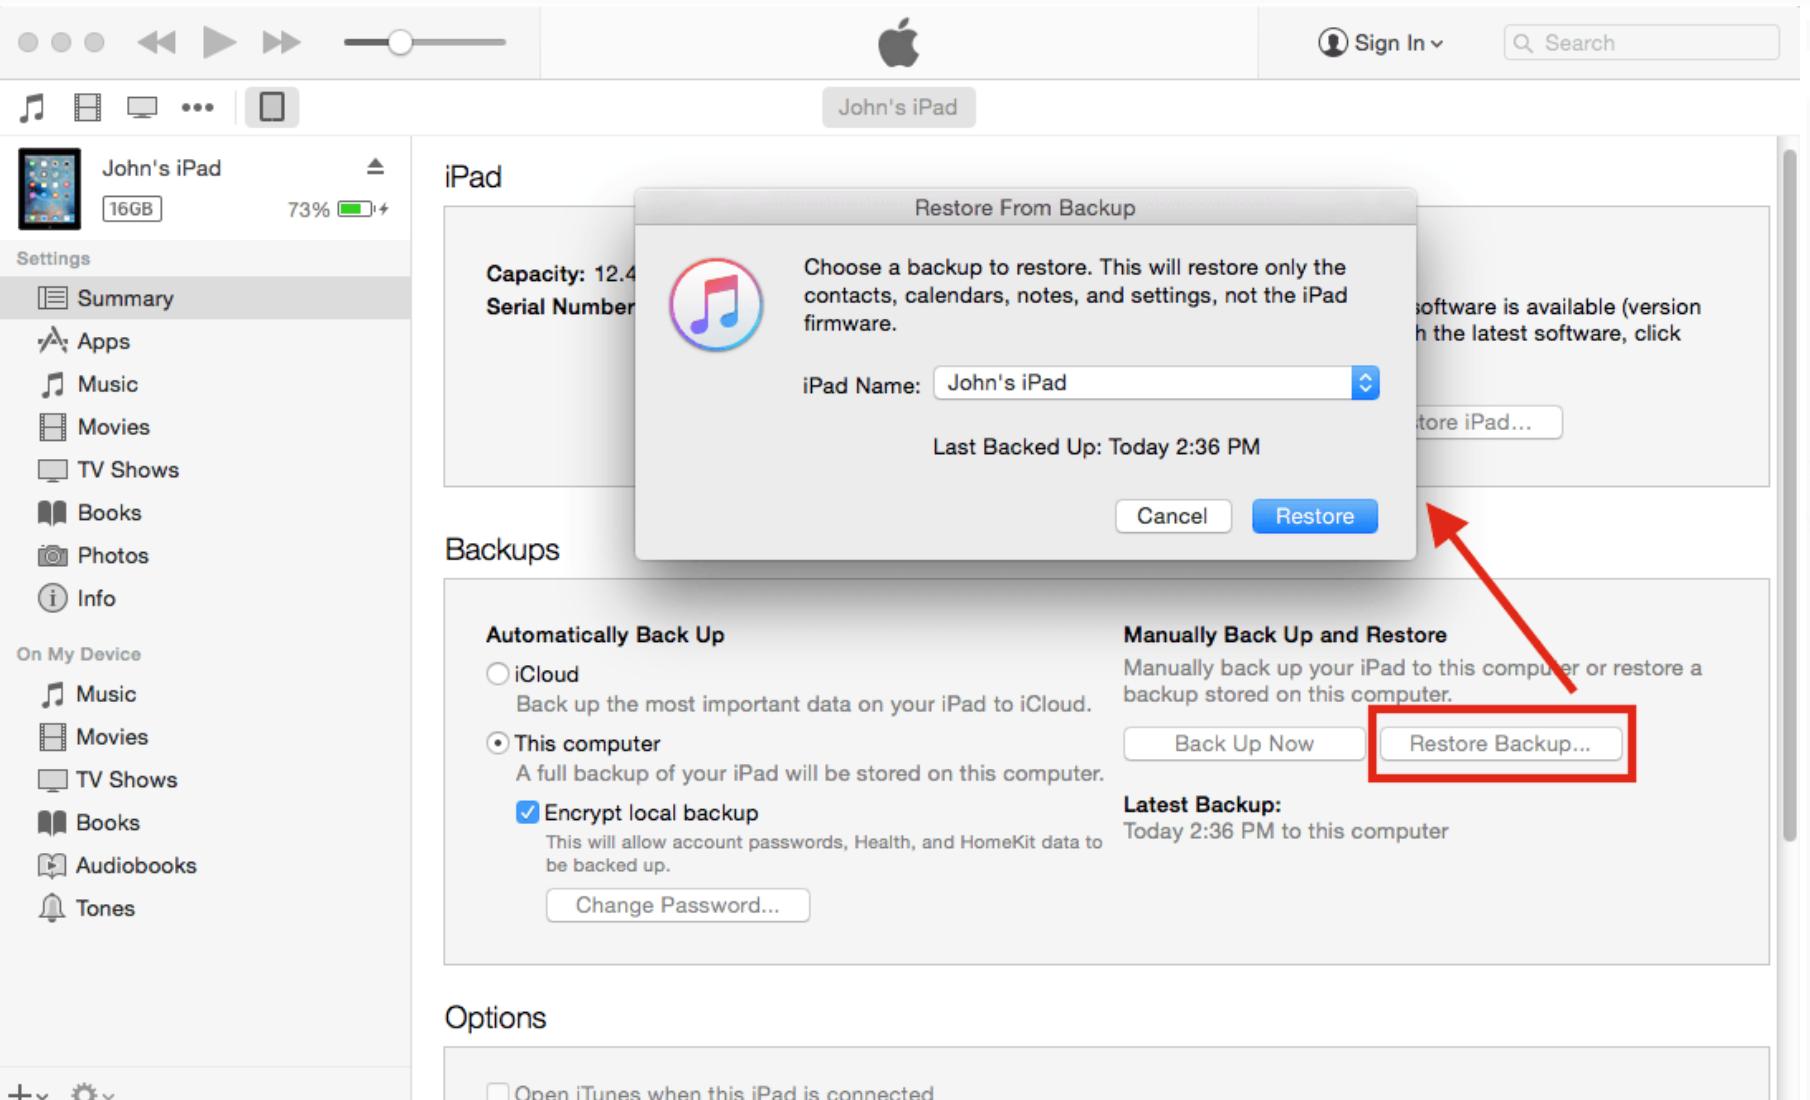 unlock-iPad-without-password-via-iTunes-backup-01